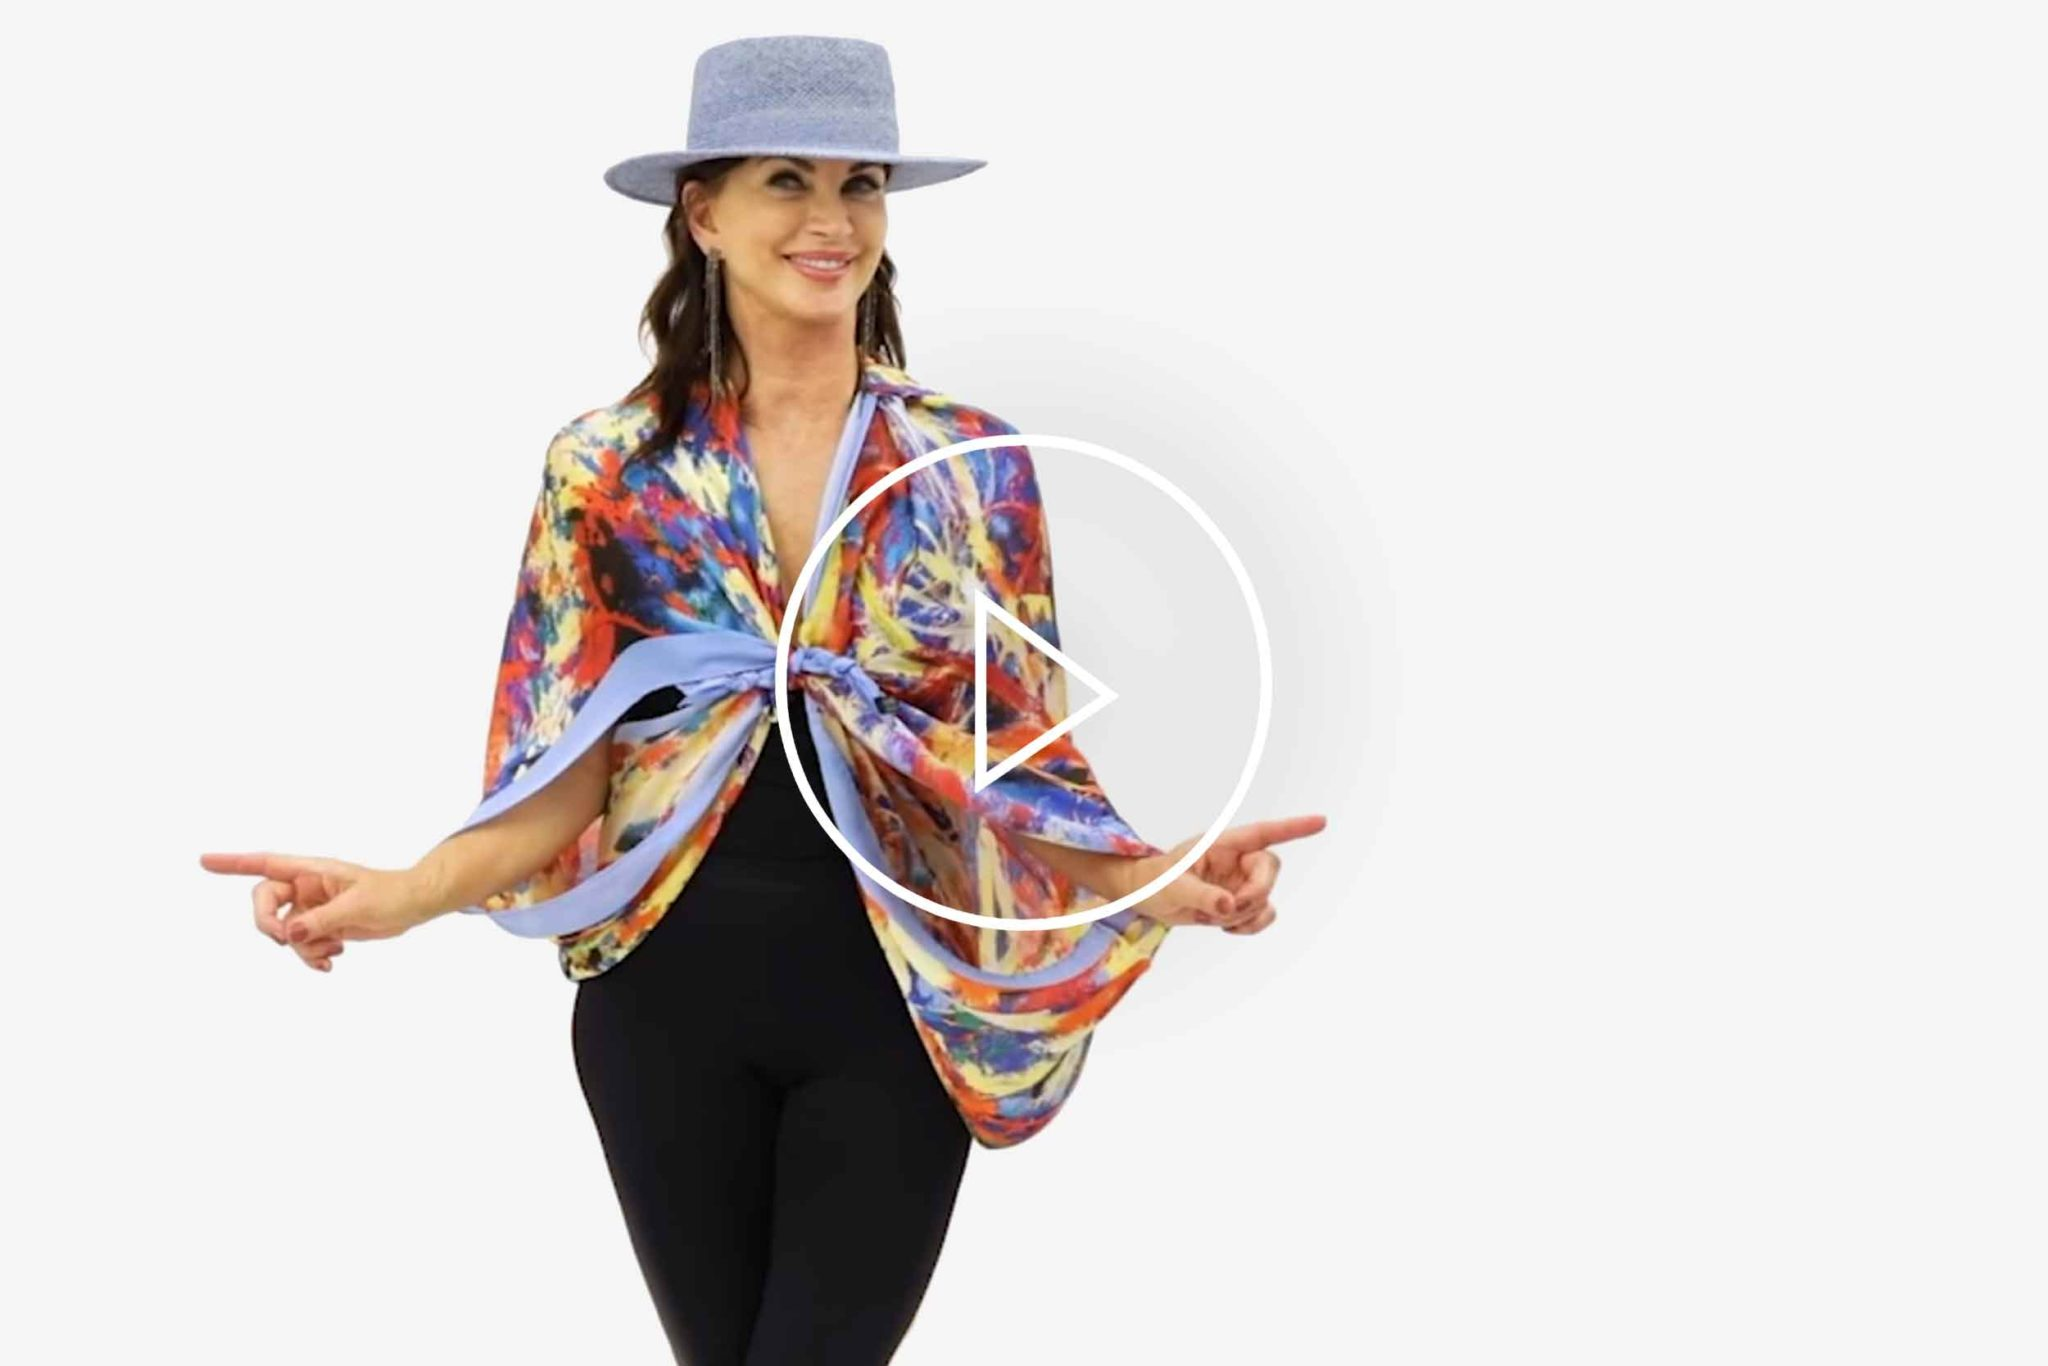 Cornelia Hagmann La Galleria Silk Scarves Styles Inspirations No 16 17 18, Seidenschal, sciarpa di seta, foulard soie,